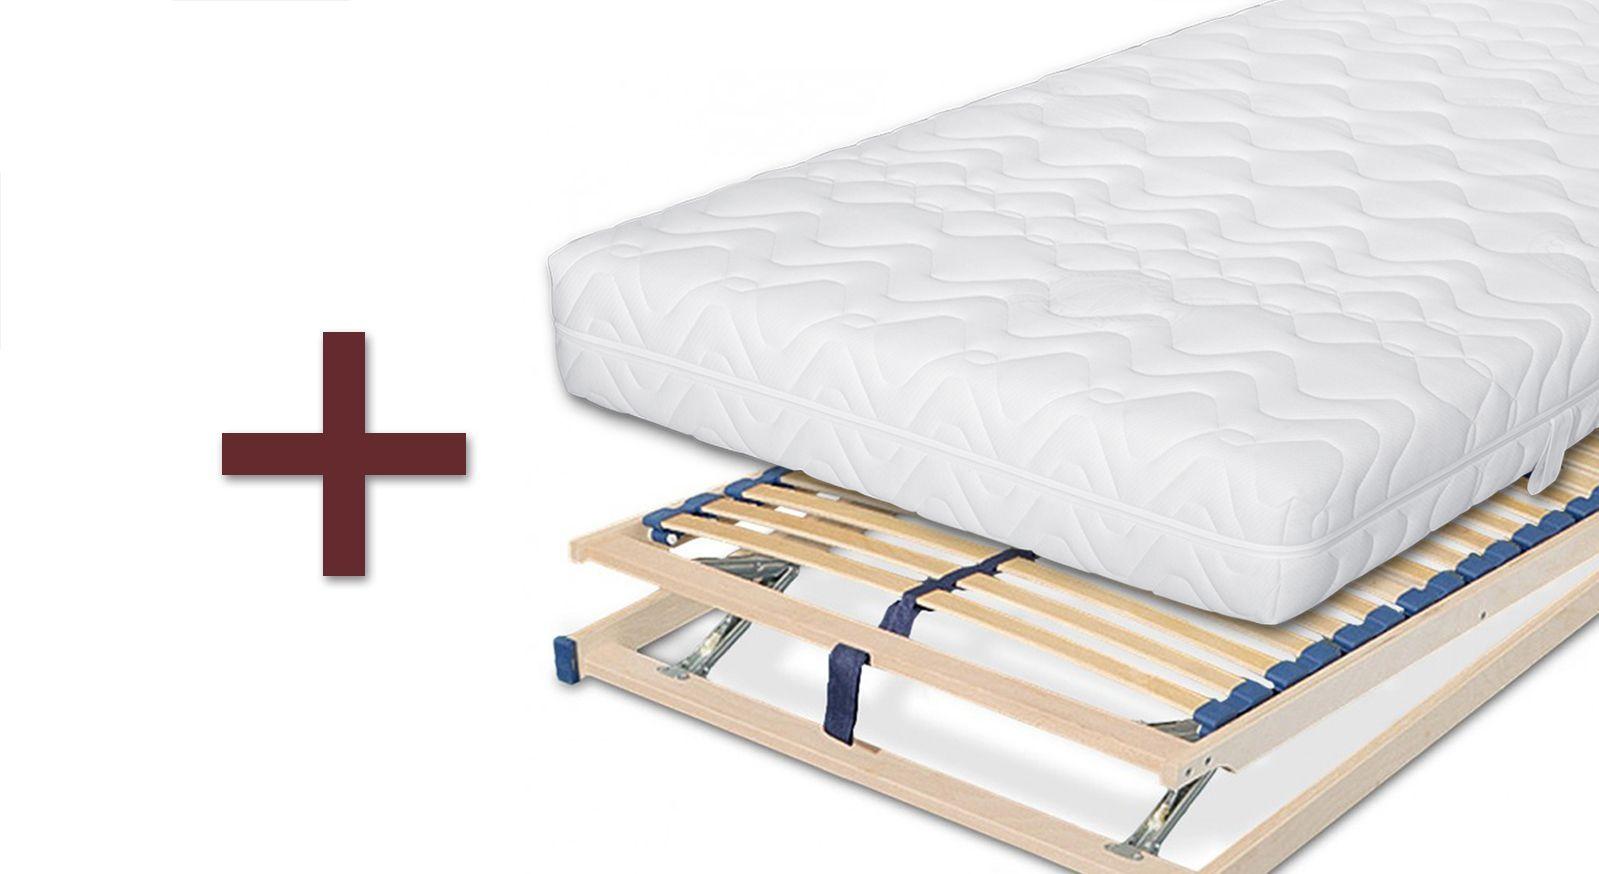 malie lattenrost taschenfederkern matratze im set polar combi. Black Bedroom Furniture Sets. Home Design Ideas